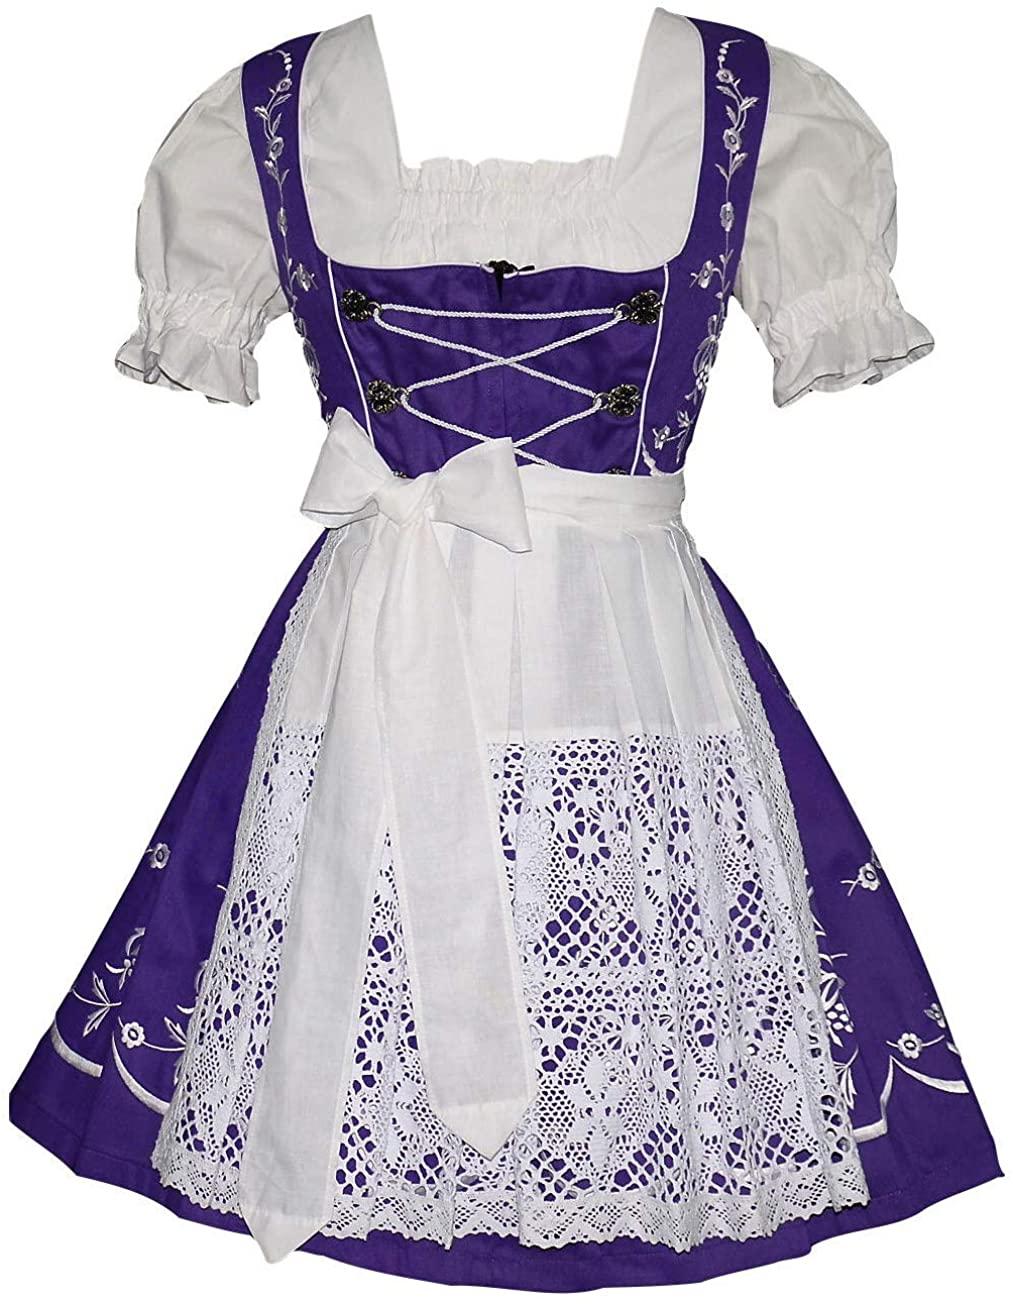 3-Pcs Short Womens Dirndl German Waitress Embroidered Oktoberfest Purple Dress